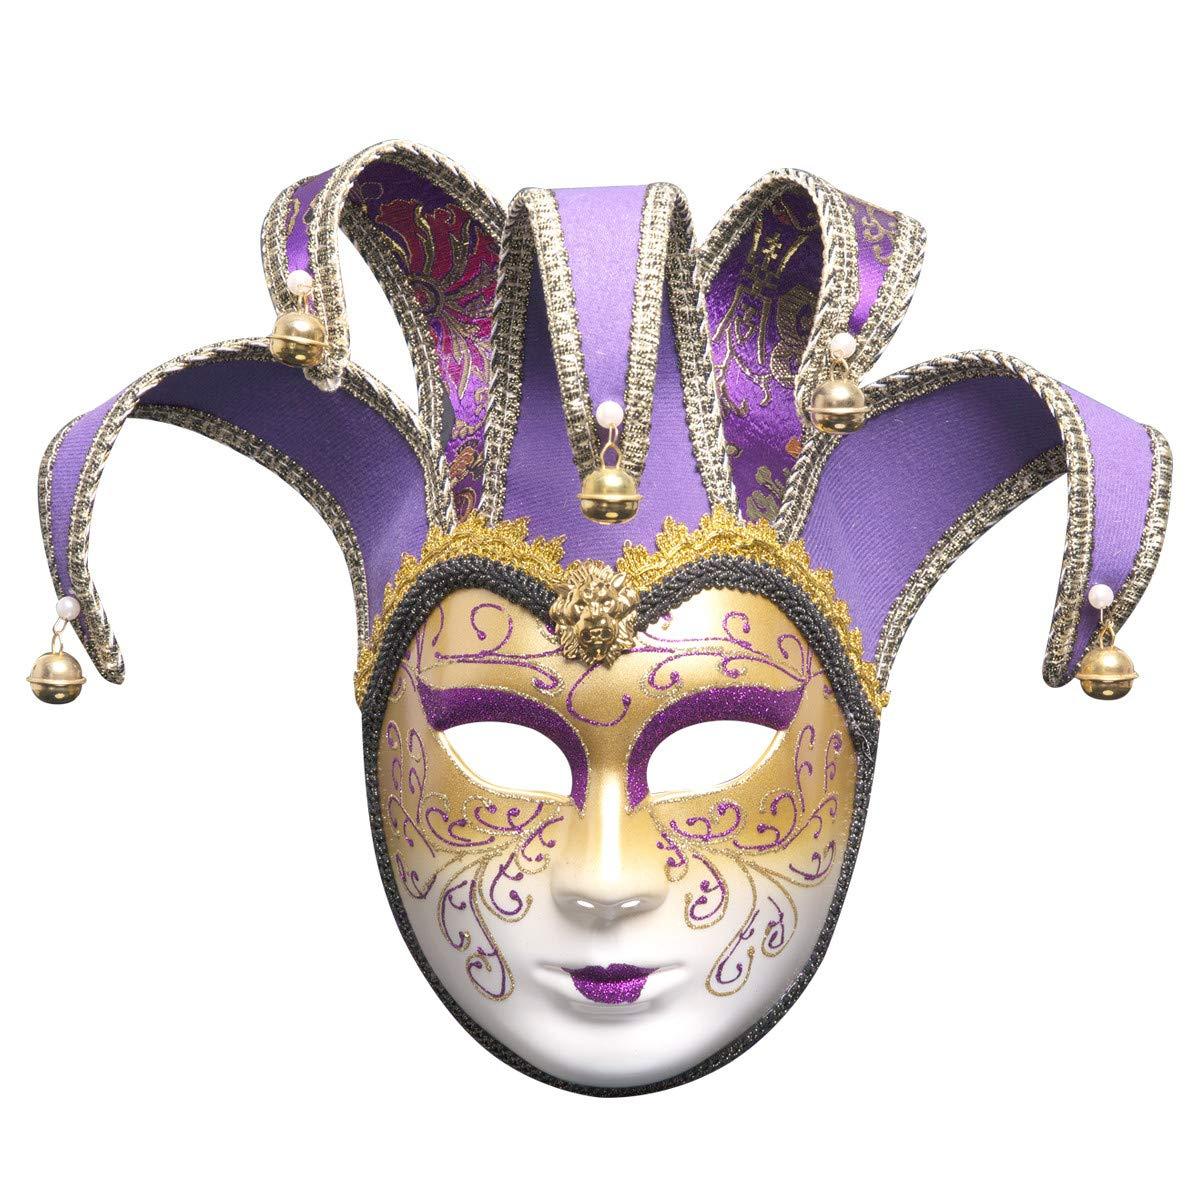 Sonmer Full Face Venetian Joker Masquerade Theater Mask, Mardi Gras Party Ball Mask (Purple)